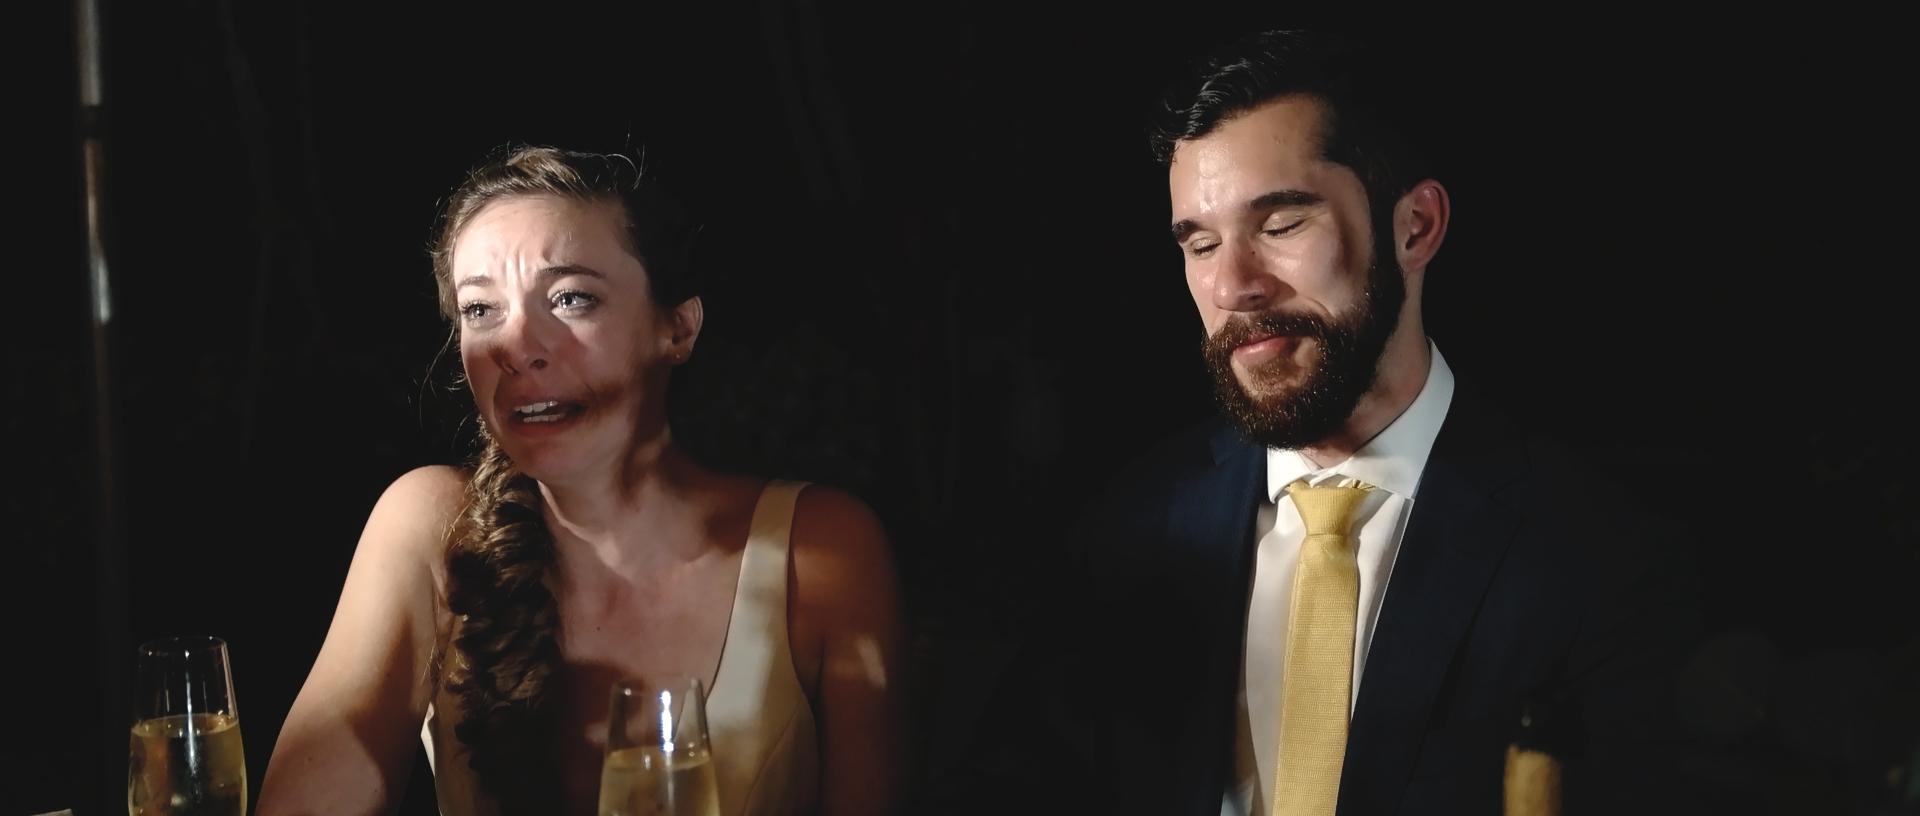 Miami Destination Wedding Film0035.jpg